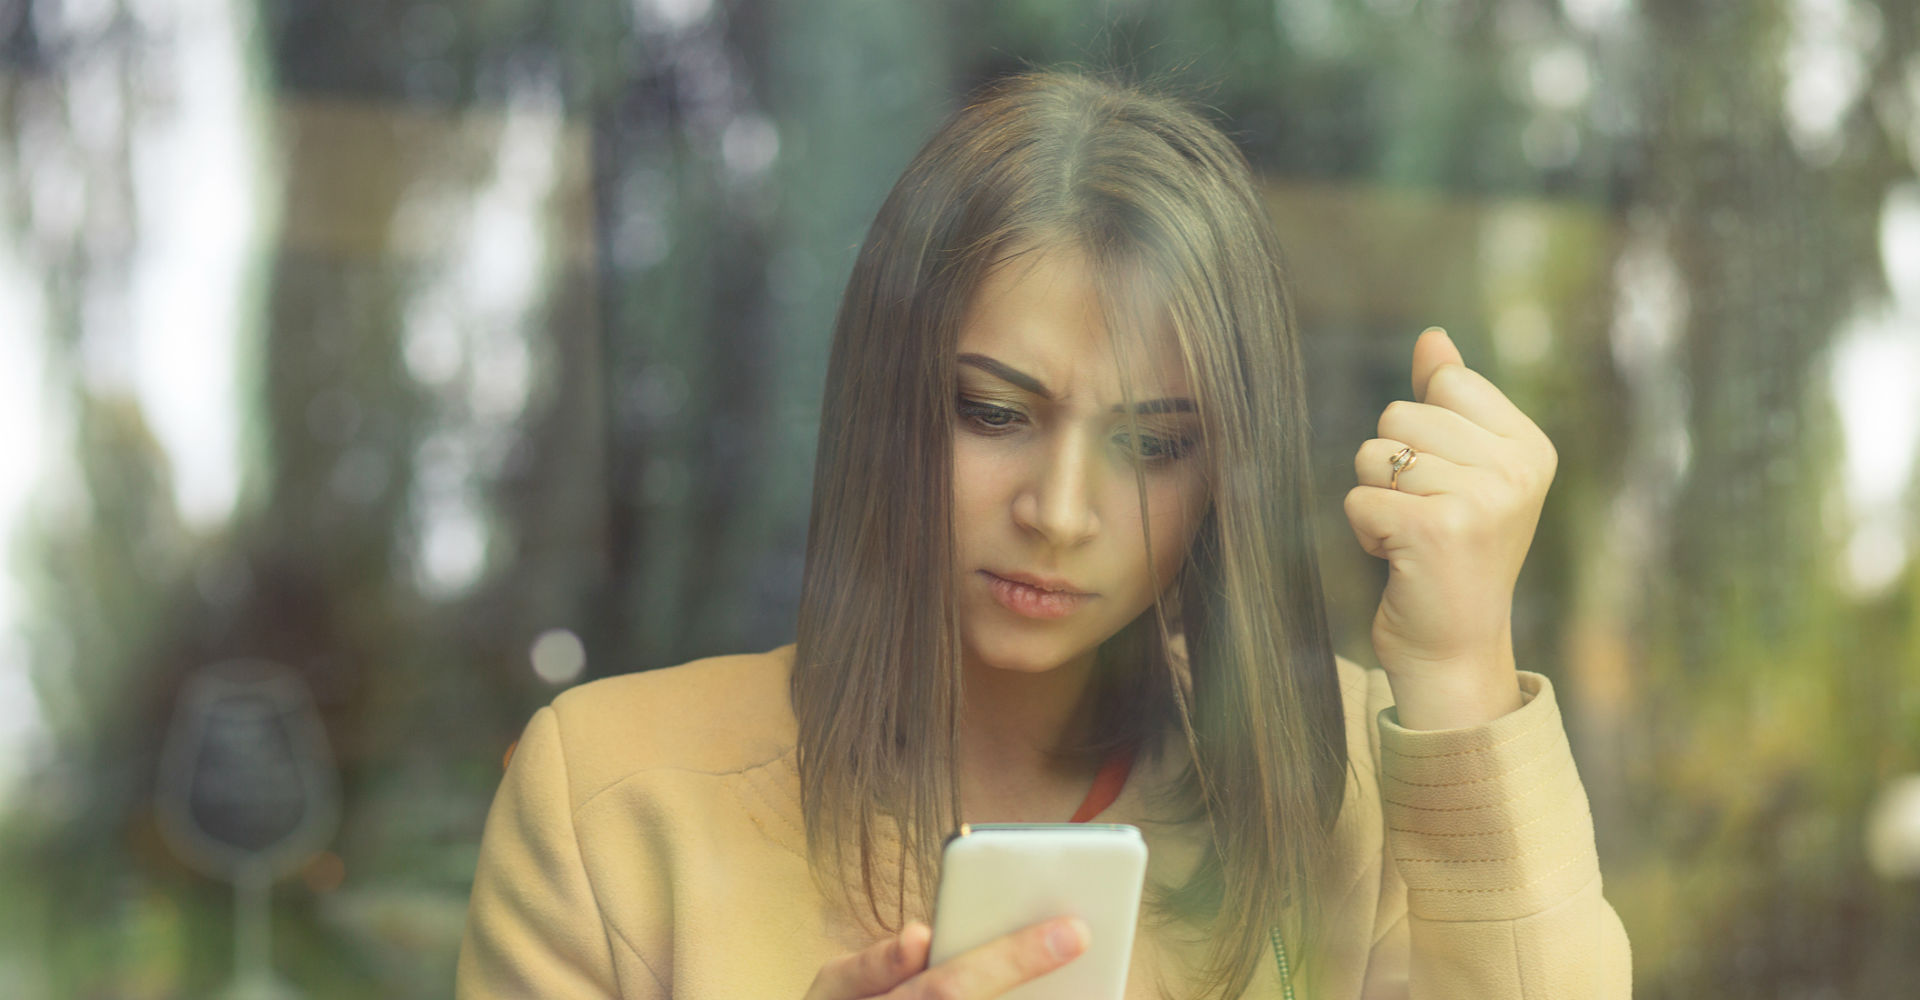 Frau testet an ihrem Smartphone beliebte Android-Apps.